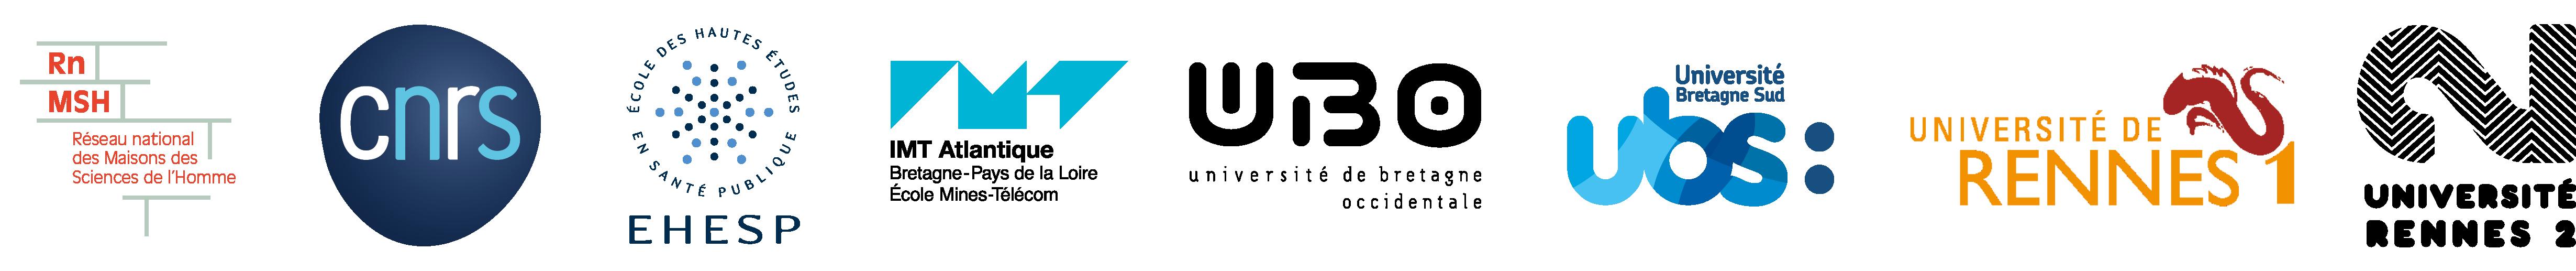 Logos fondateurs MSHB